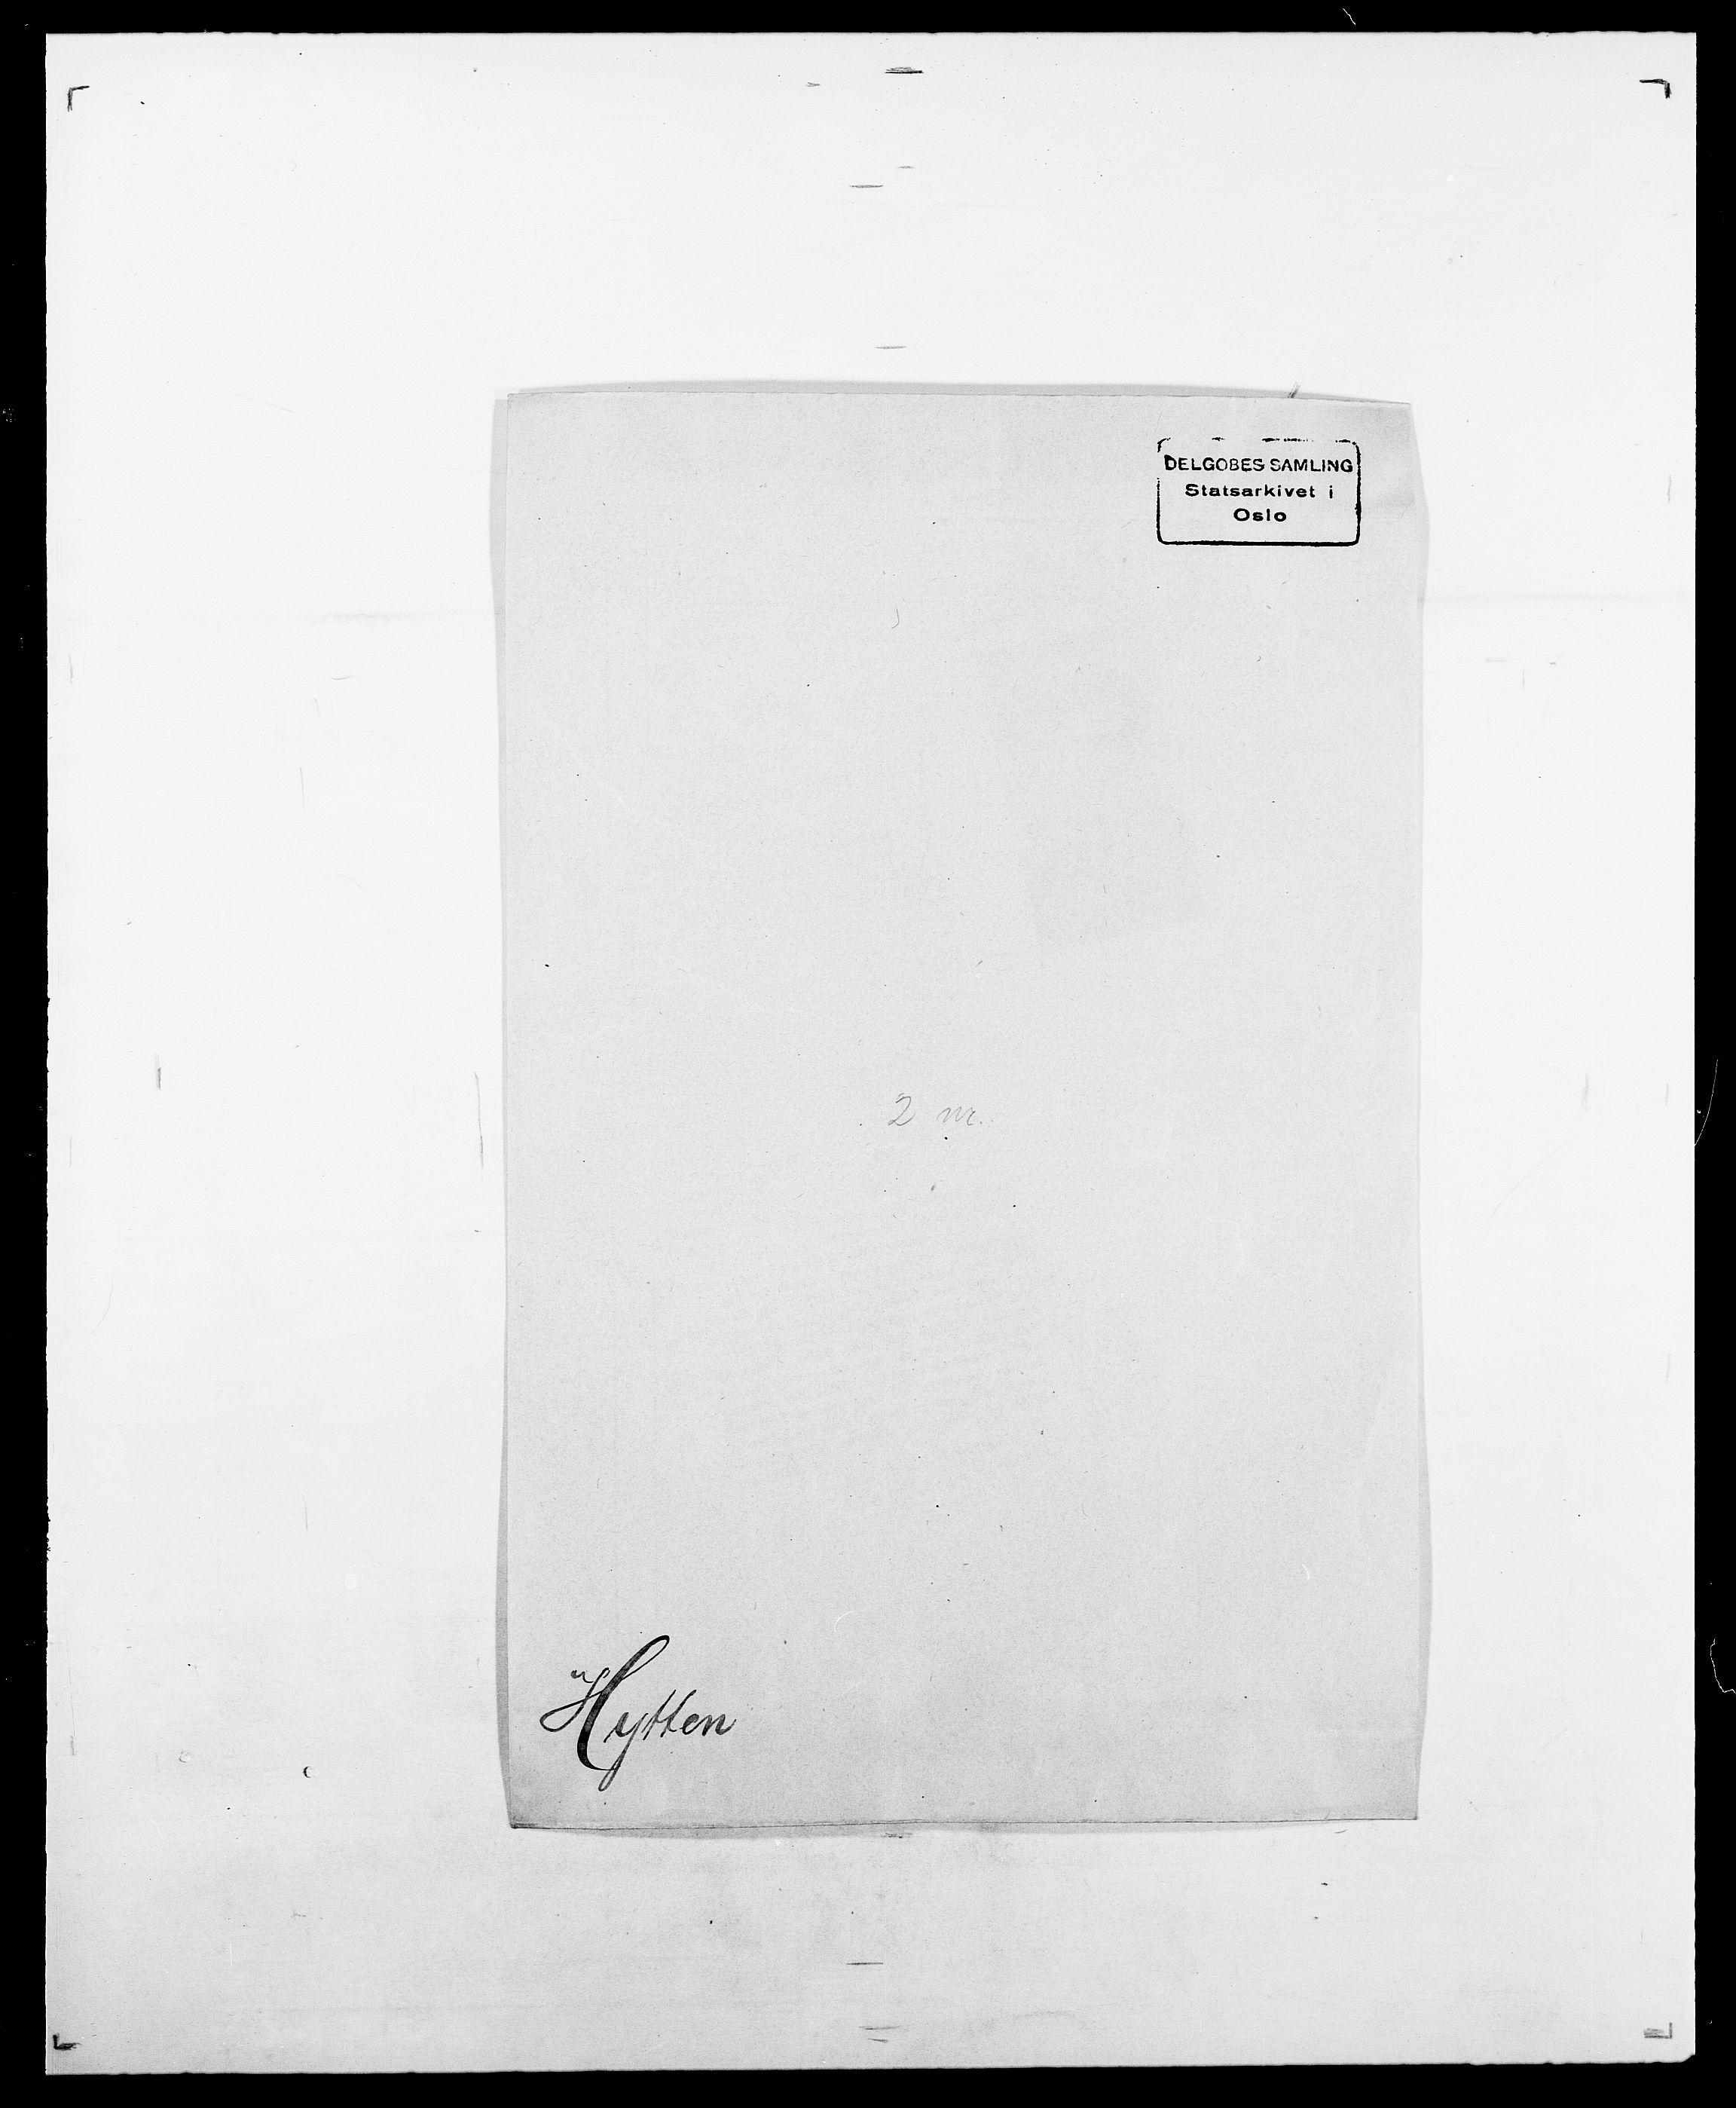 SAO, Delgobe, Charles Antoine - samling, D/Da/L0019: van der Hude - Joys, s. 300